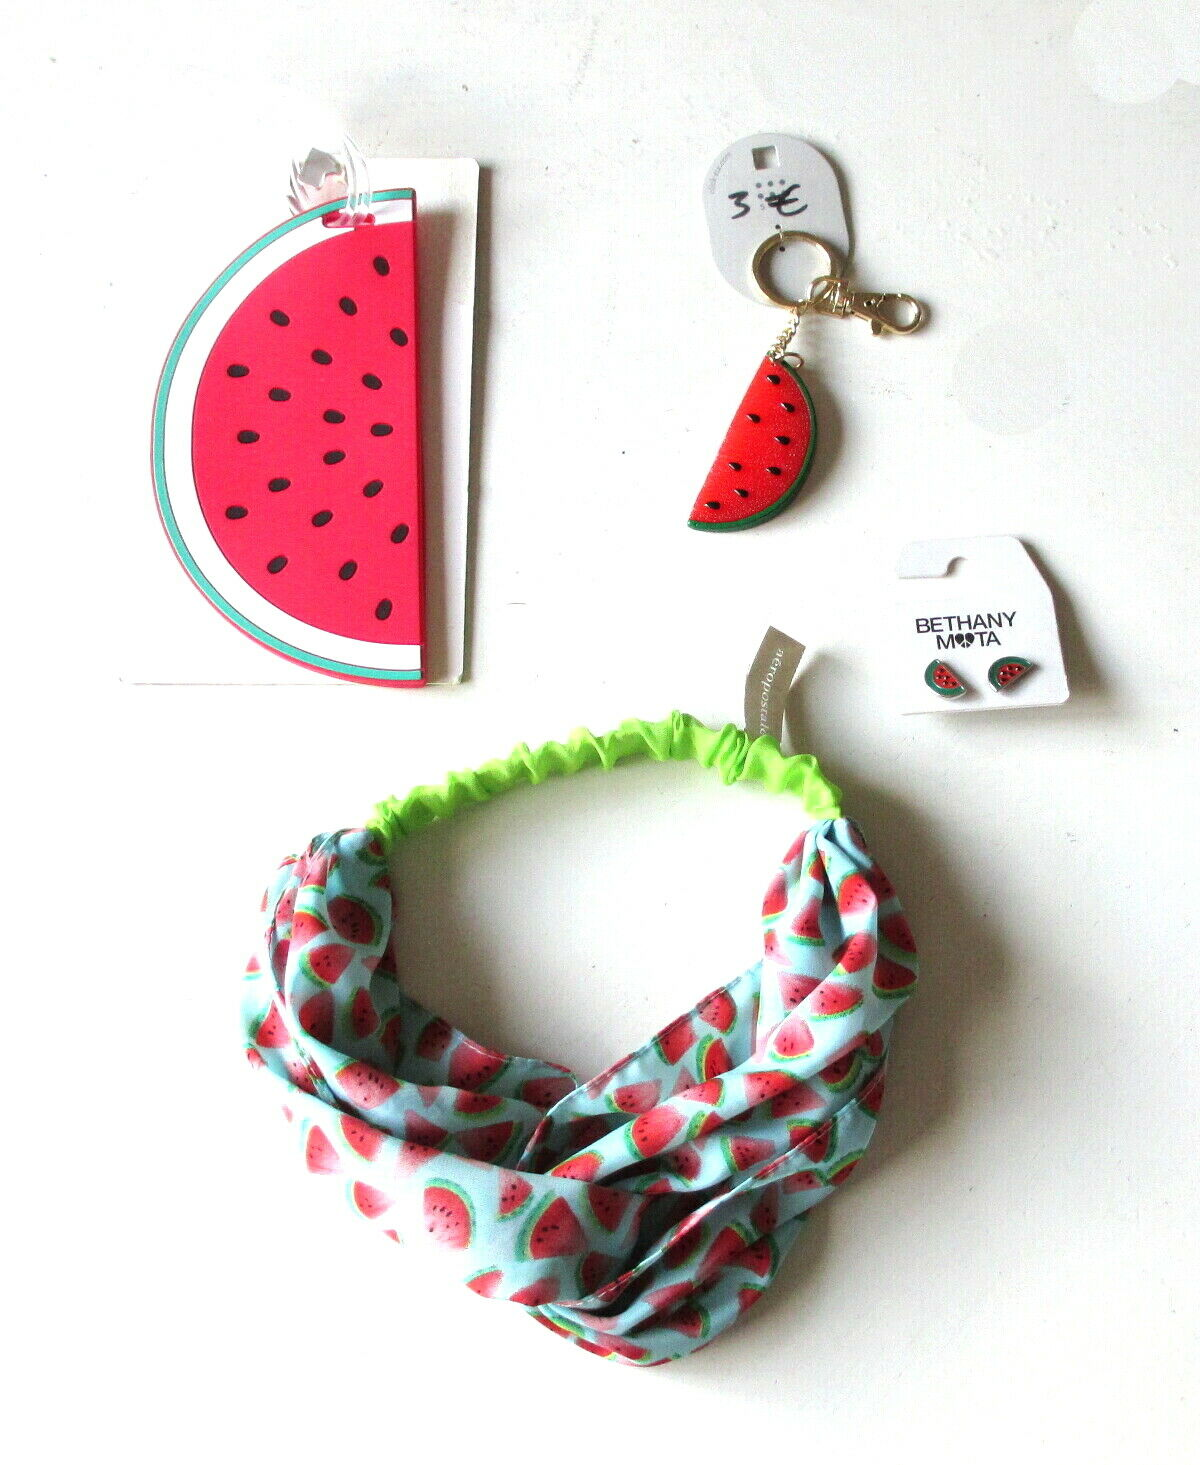 NEW Aeropostale Bethany Mota Watermelon Earrings Headband Luggage Tag Key Chain